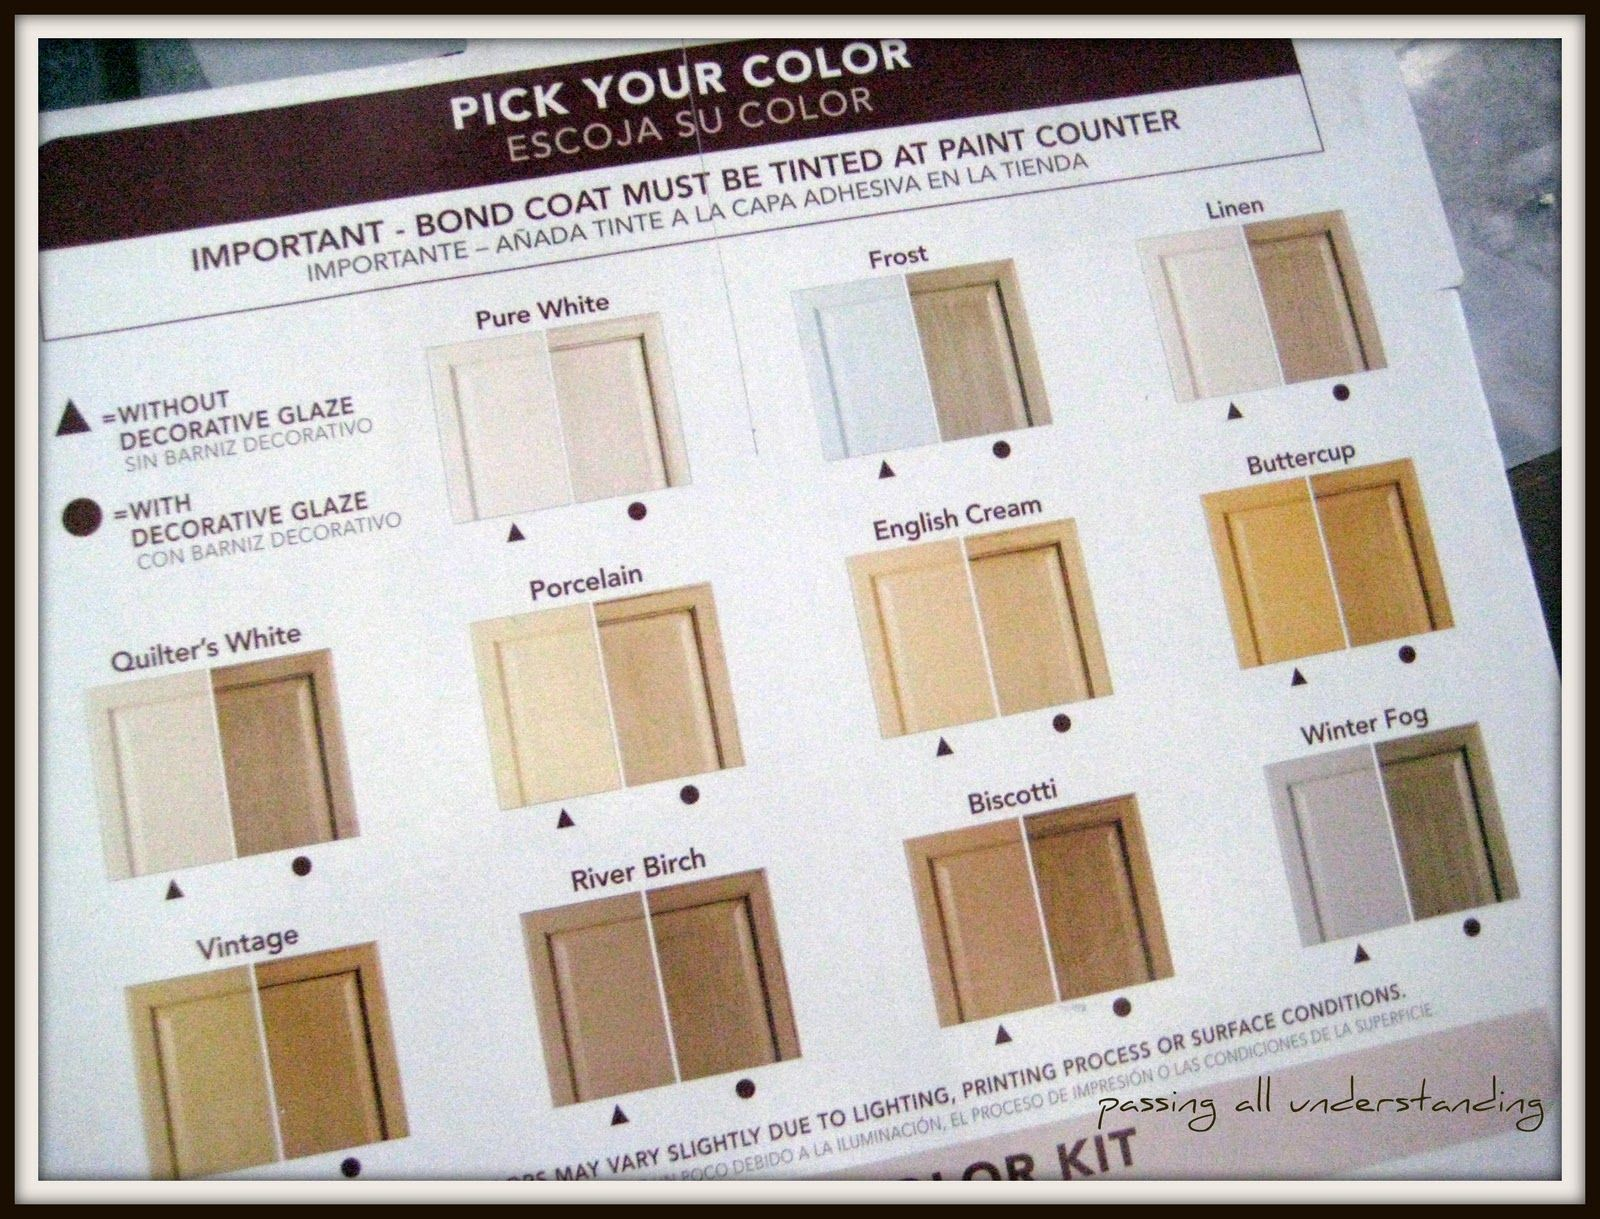 Rustoleum cabinet transformations color chart www rustoleum cabinet transformations color samples seeshiningstars nvjuhfo Choice Image